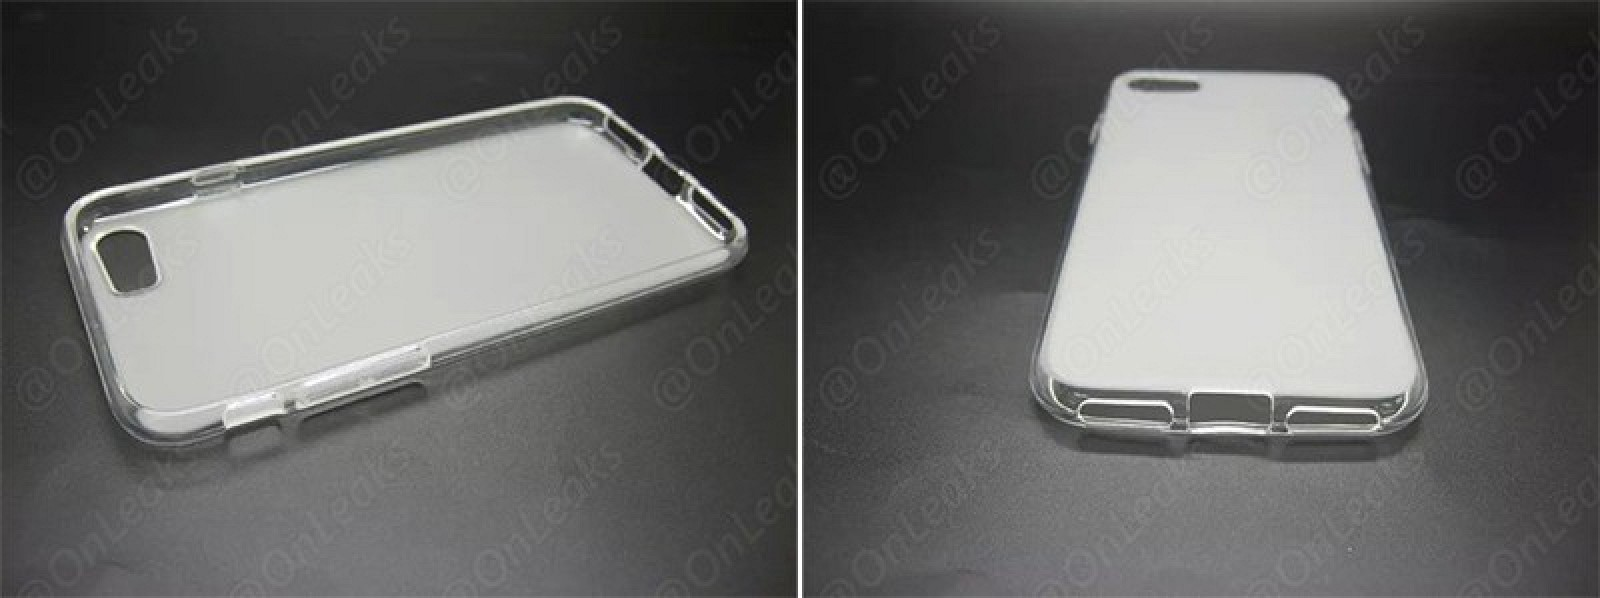 iPhone-7-OnLeaks-Case-800x299